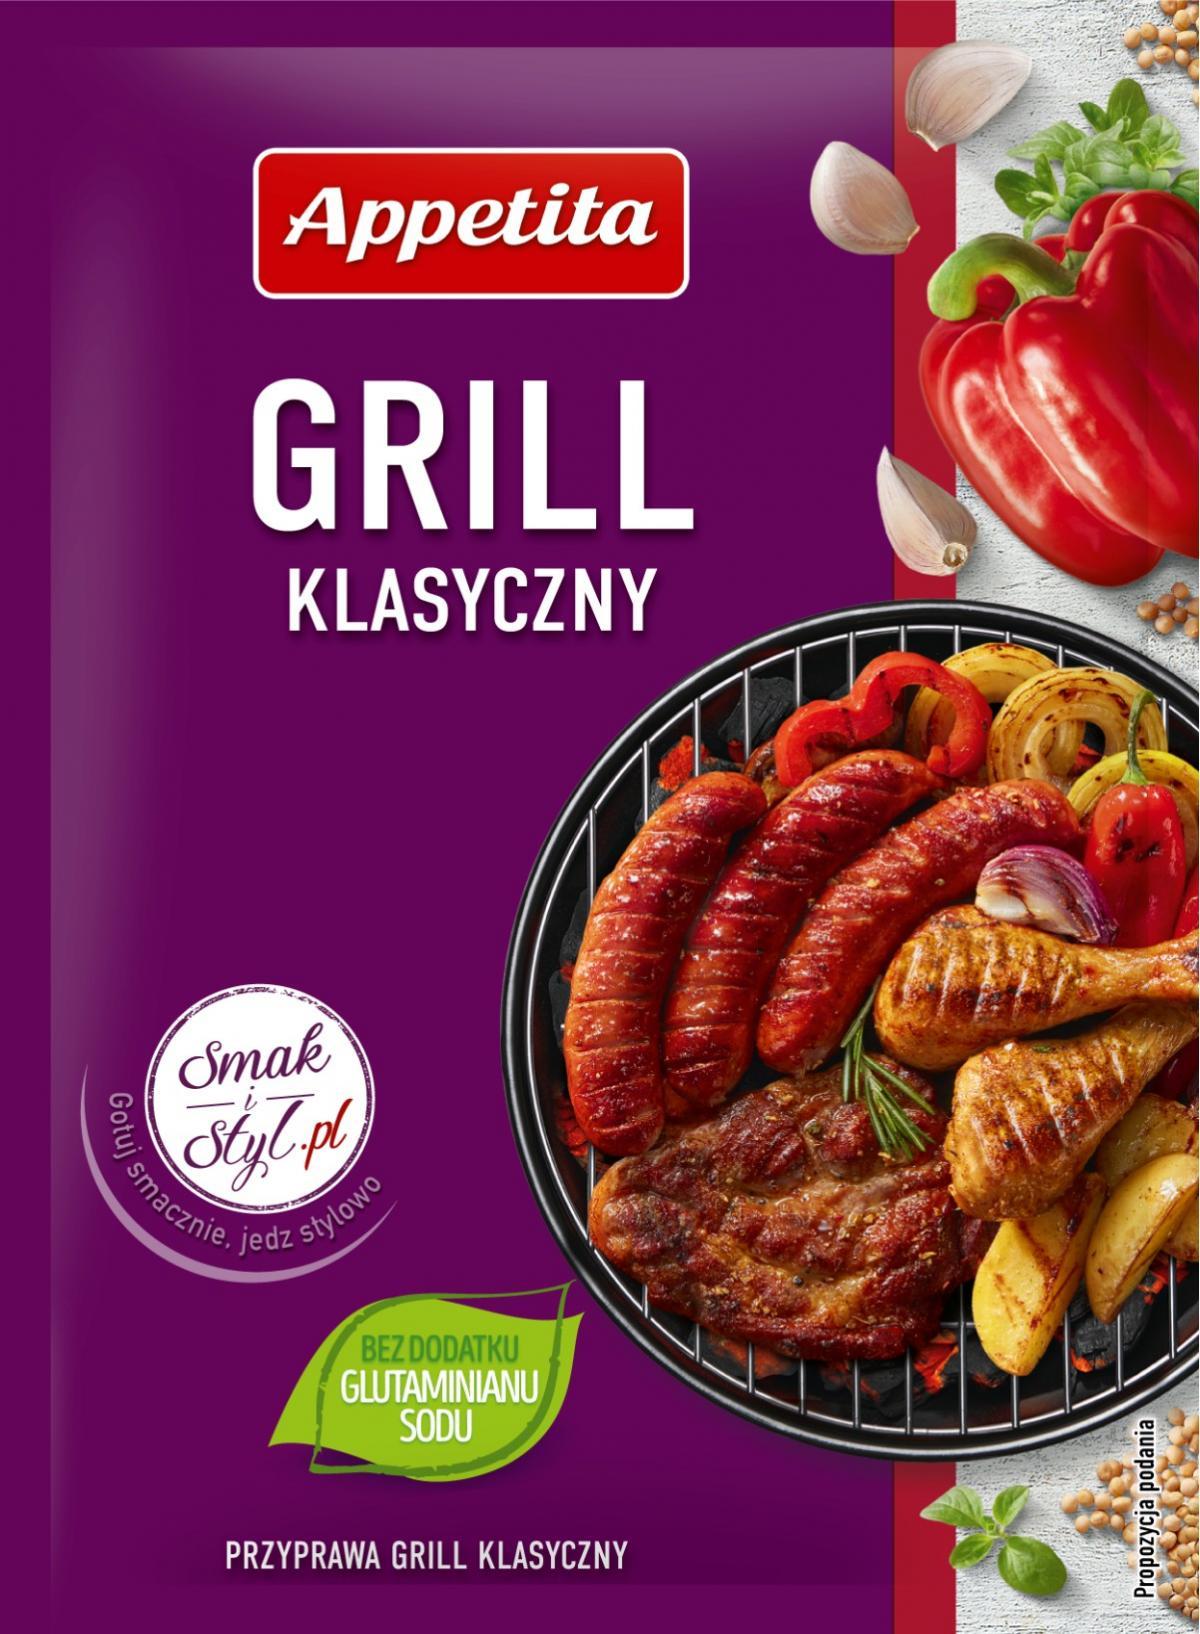 grill klasyczny appetita